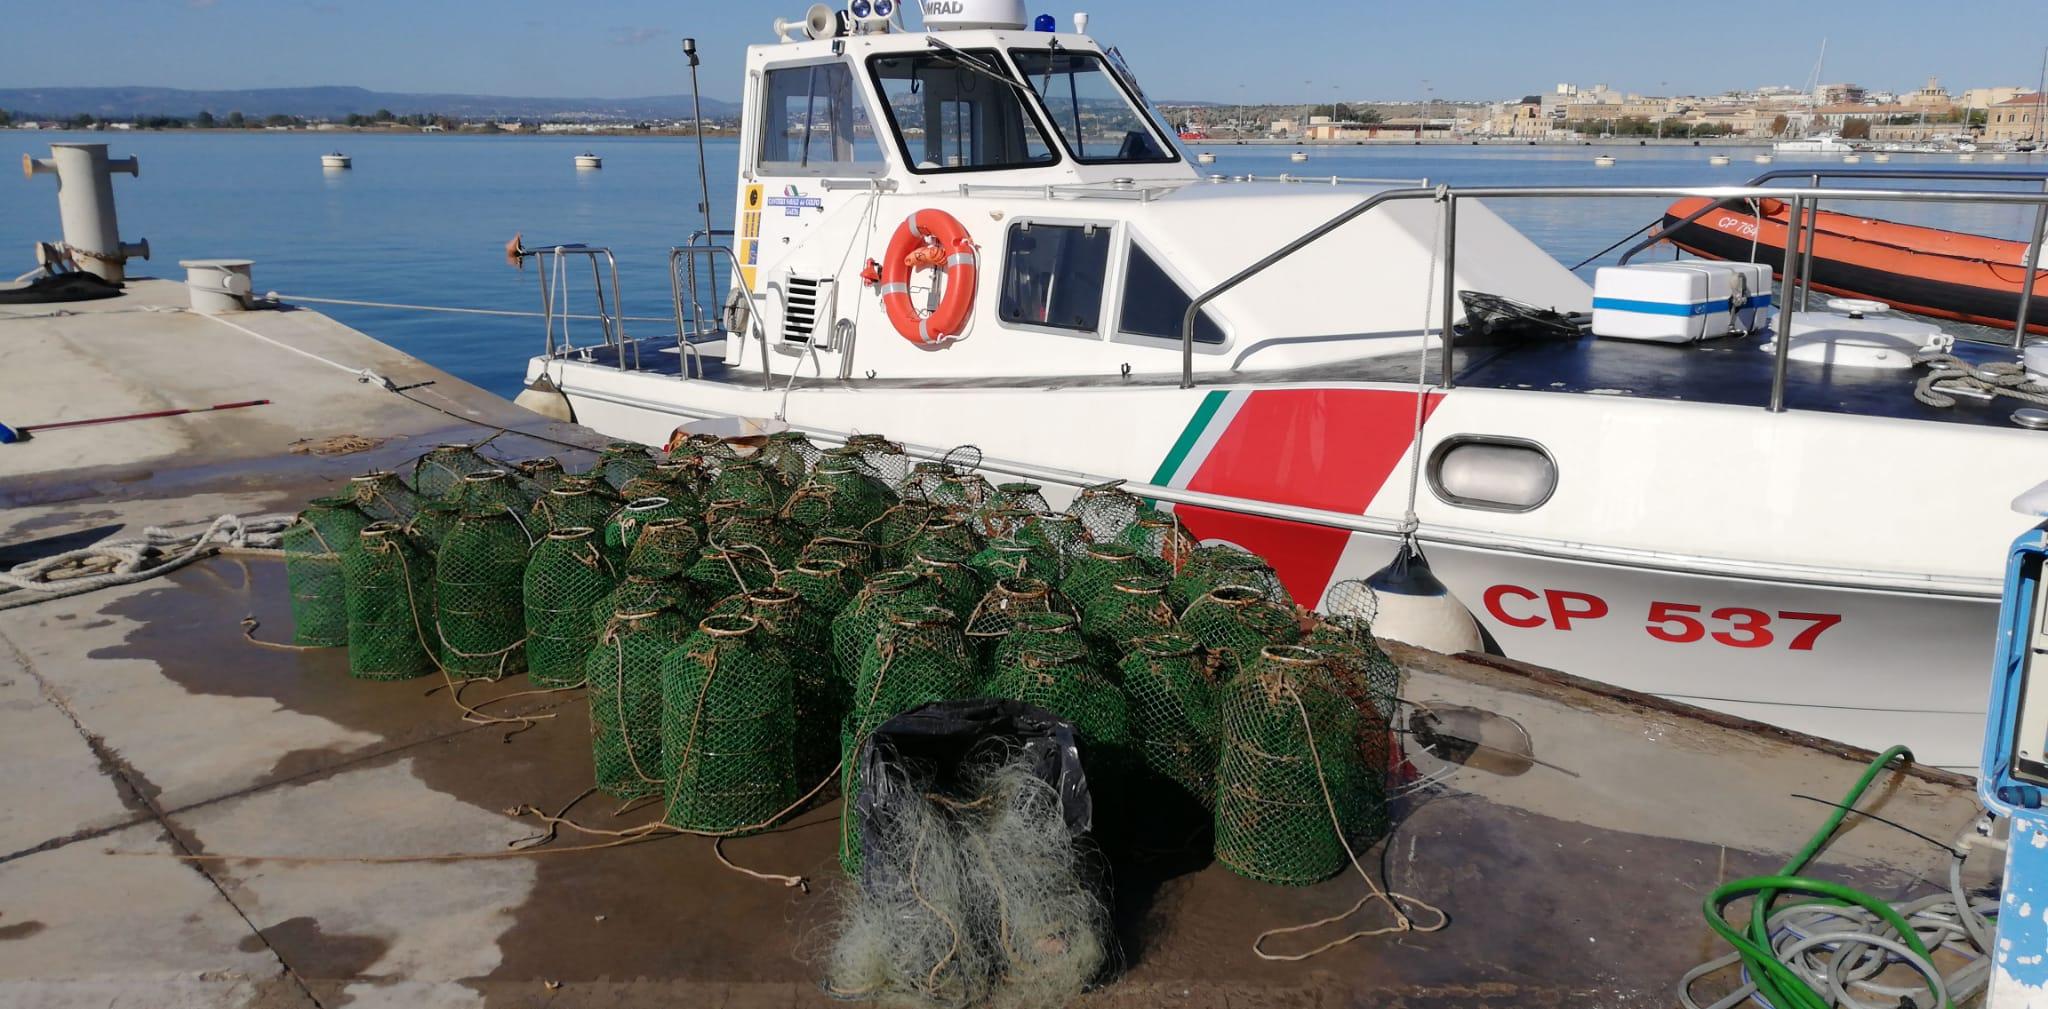 Pesca di frodo a Siracusa, sequestrai 150 ricci, una rete e  57 nasse